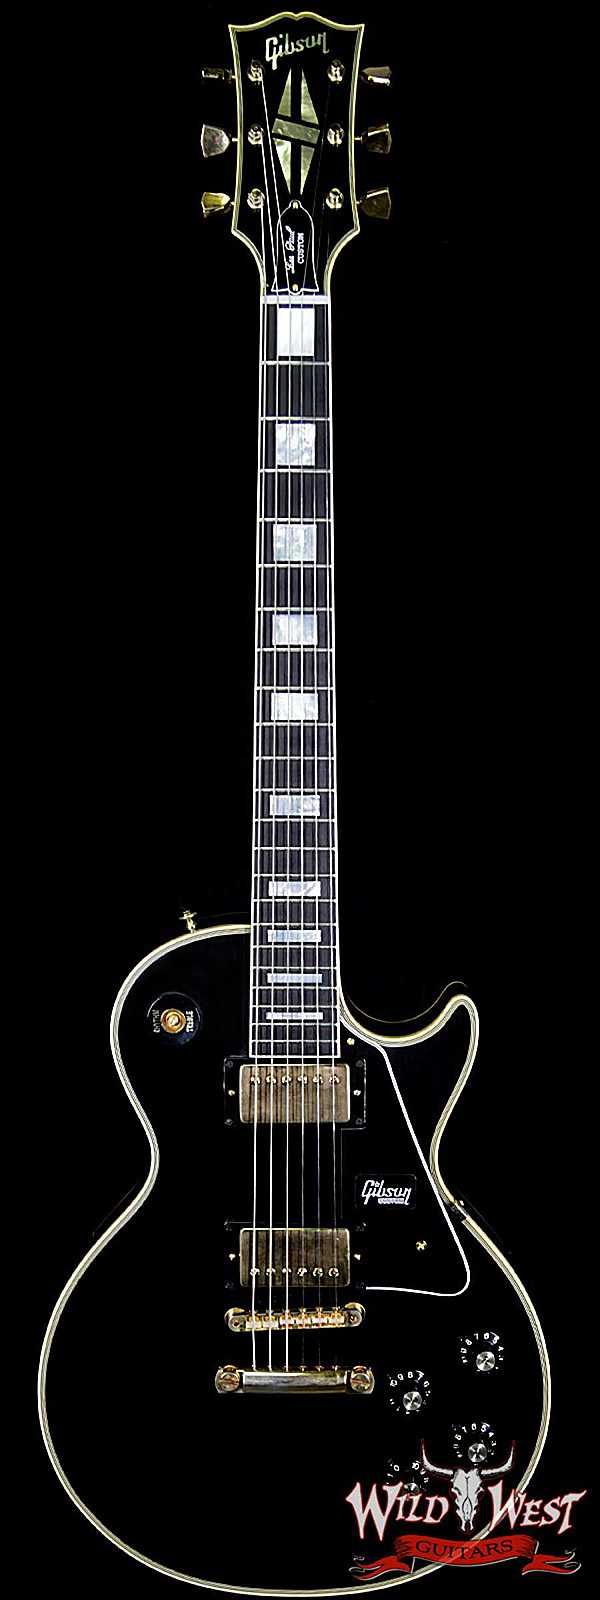 2018 Gibson Custom Shop 50th Anniversary 1968 Les Paul Custom Ebony